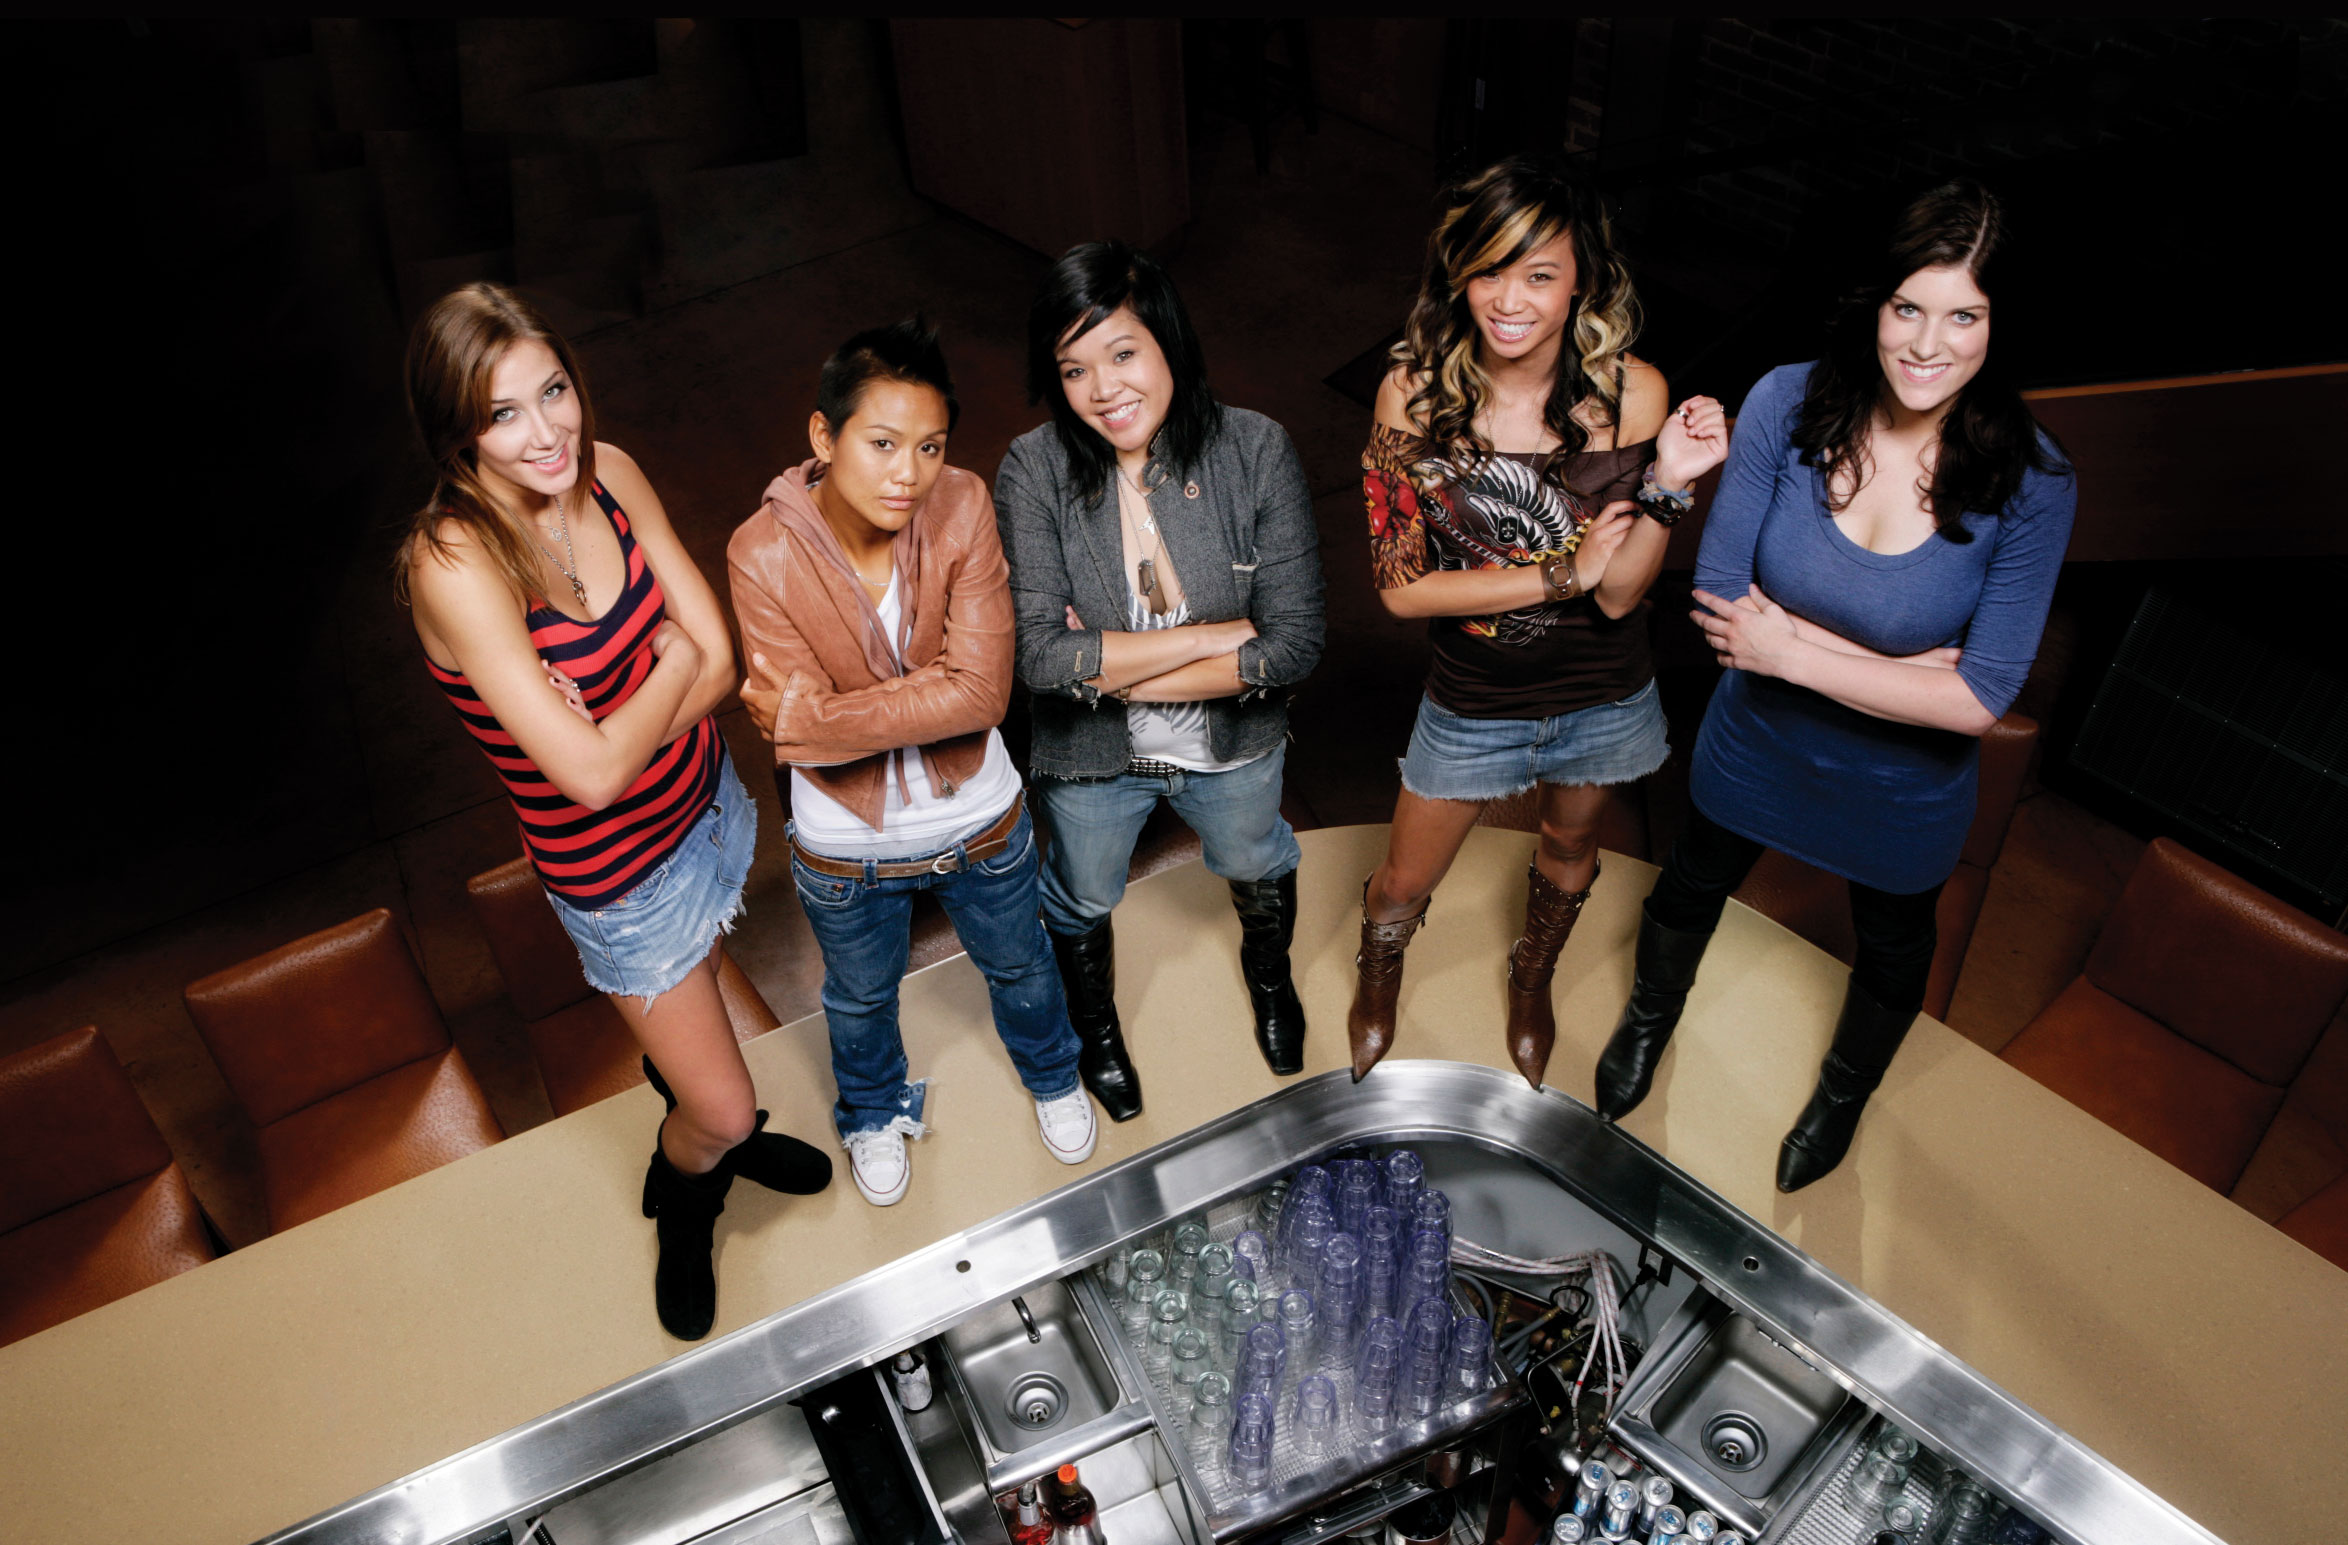 Cast (left to right):Alex Thomopoulos,Davonee Sou,Bathilda Hsu,Robin Koethcke & Charlene Borja